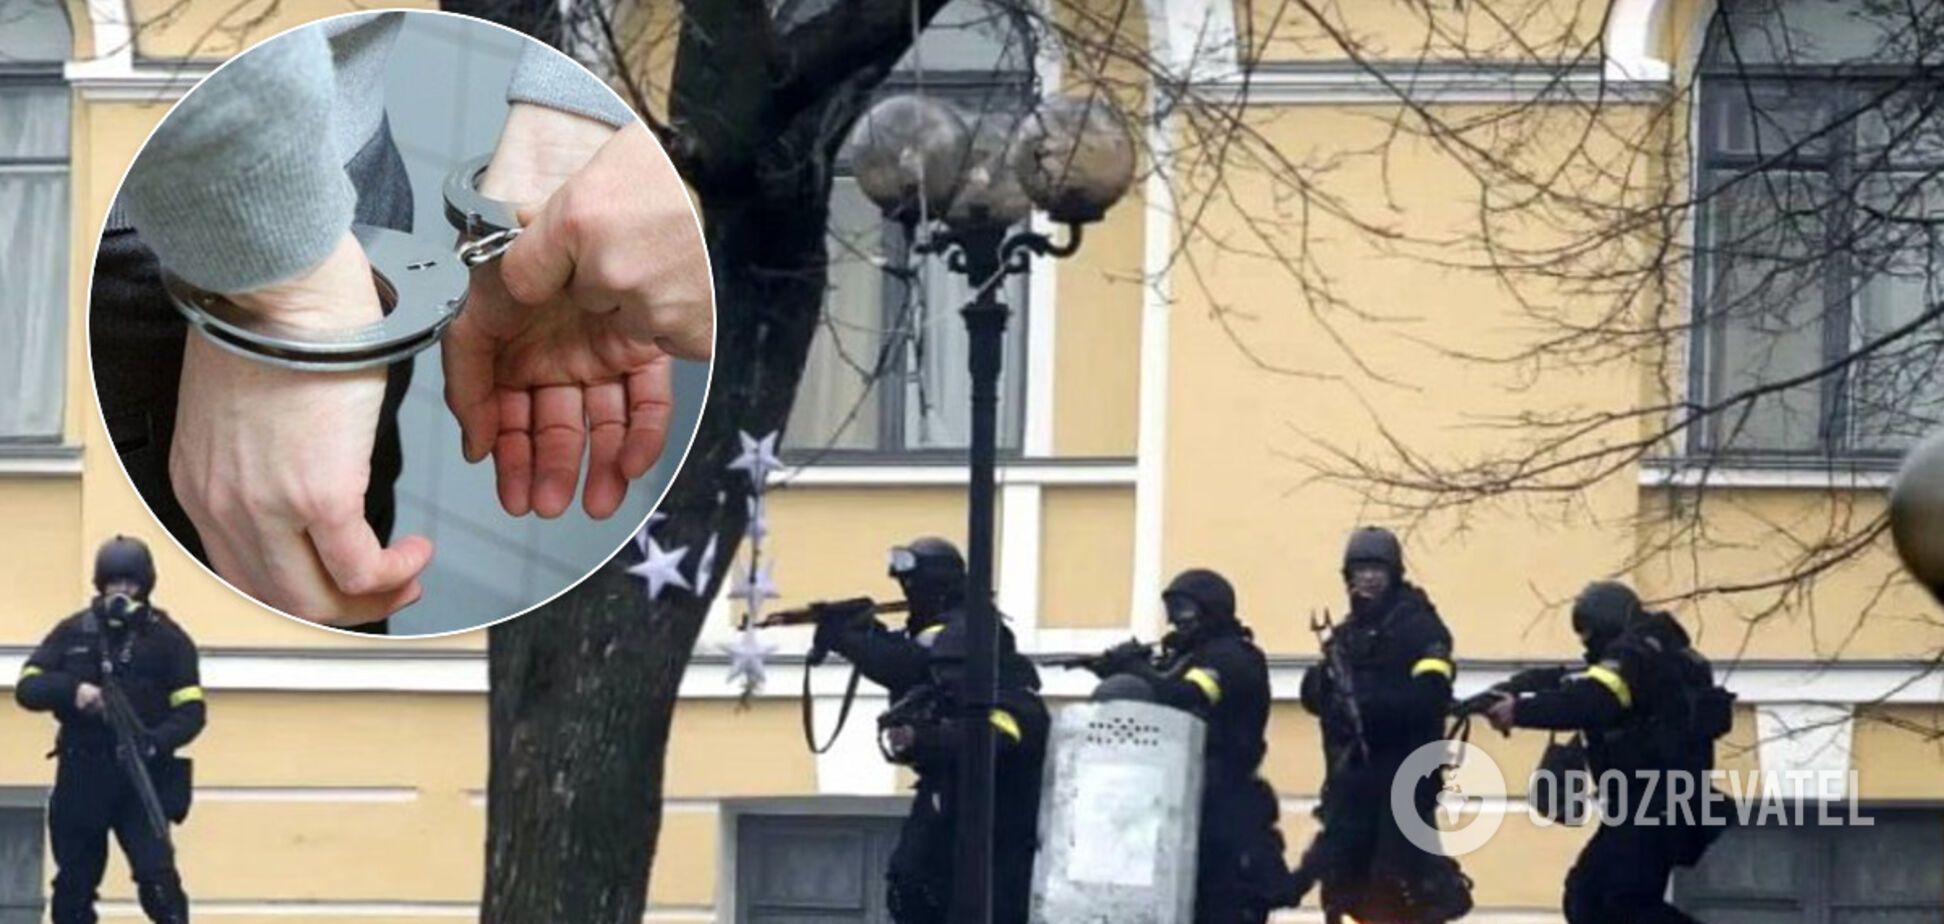 Расстрелы на Майдане: Генпрокуратура объявила подозрение экс-силовику 'Омеги'